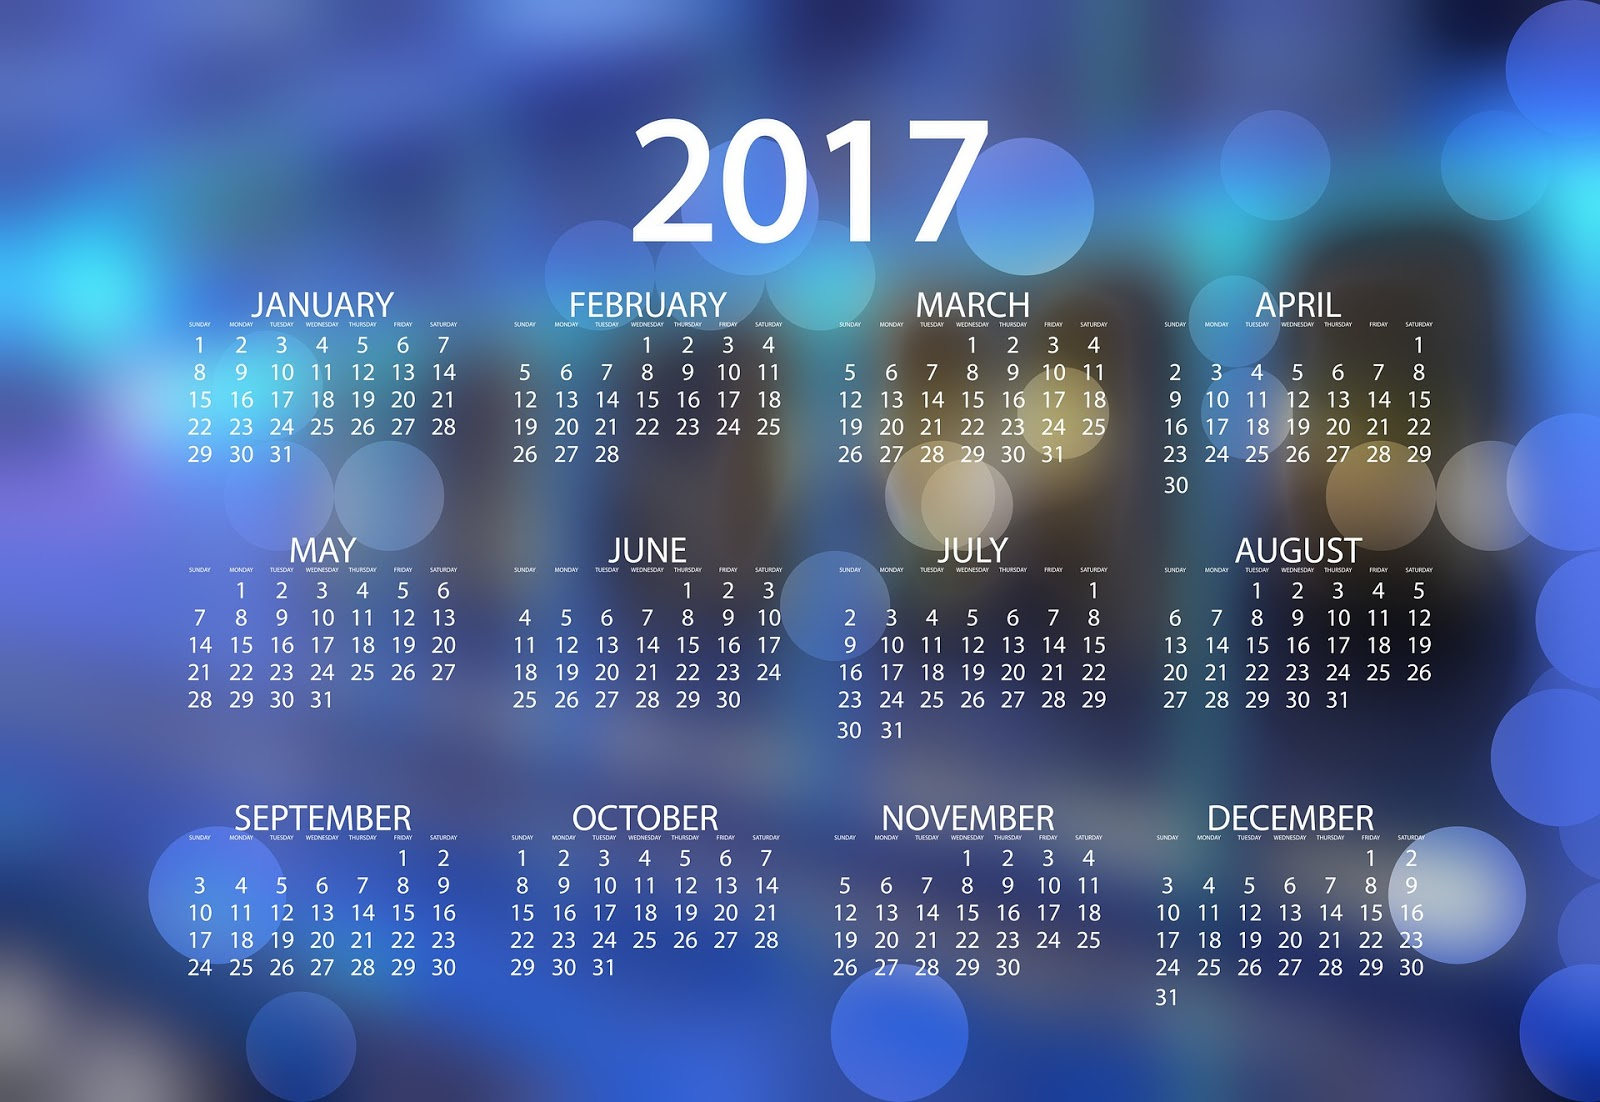 calendar 2017 wallpapers high quality download free. Black Bedroom Furniture Sets. Home Design Ideas